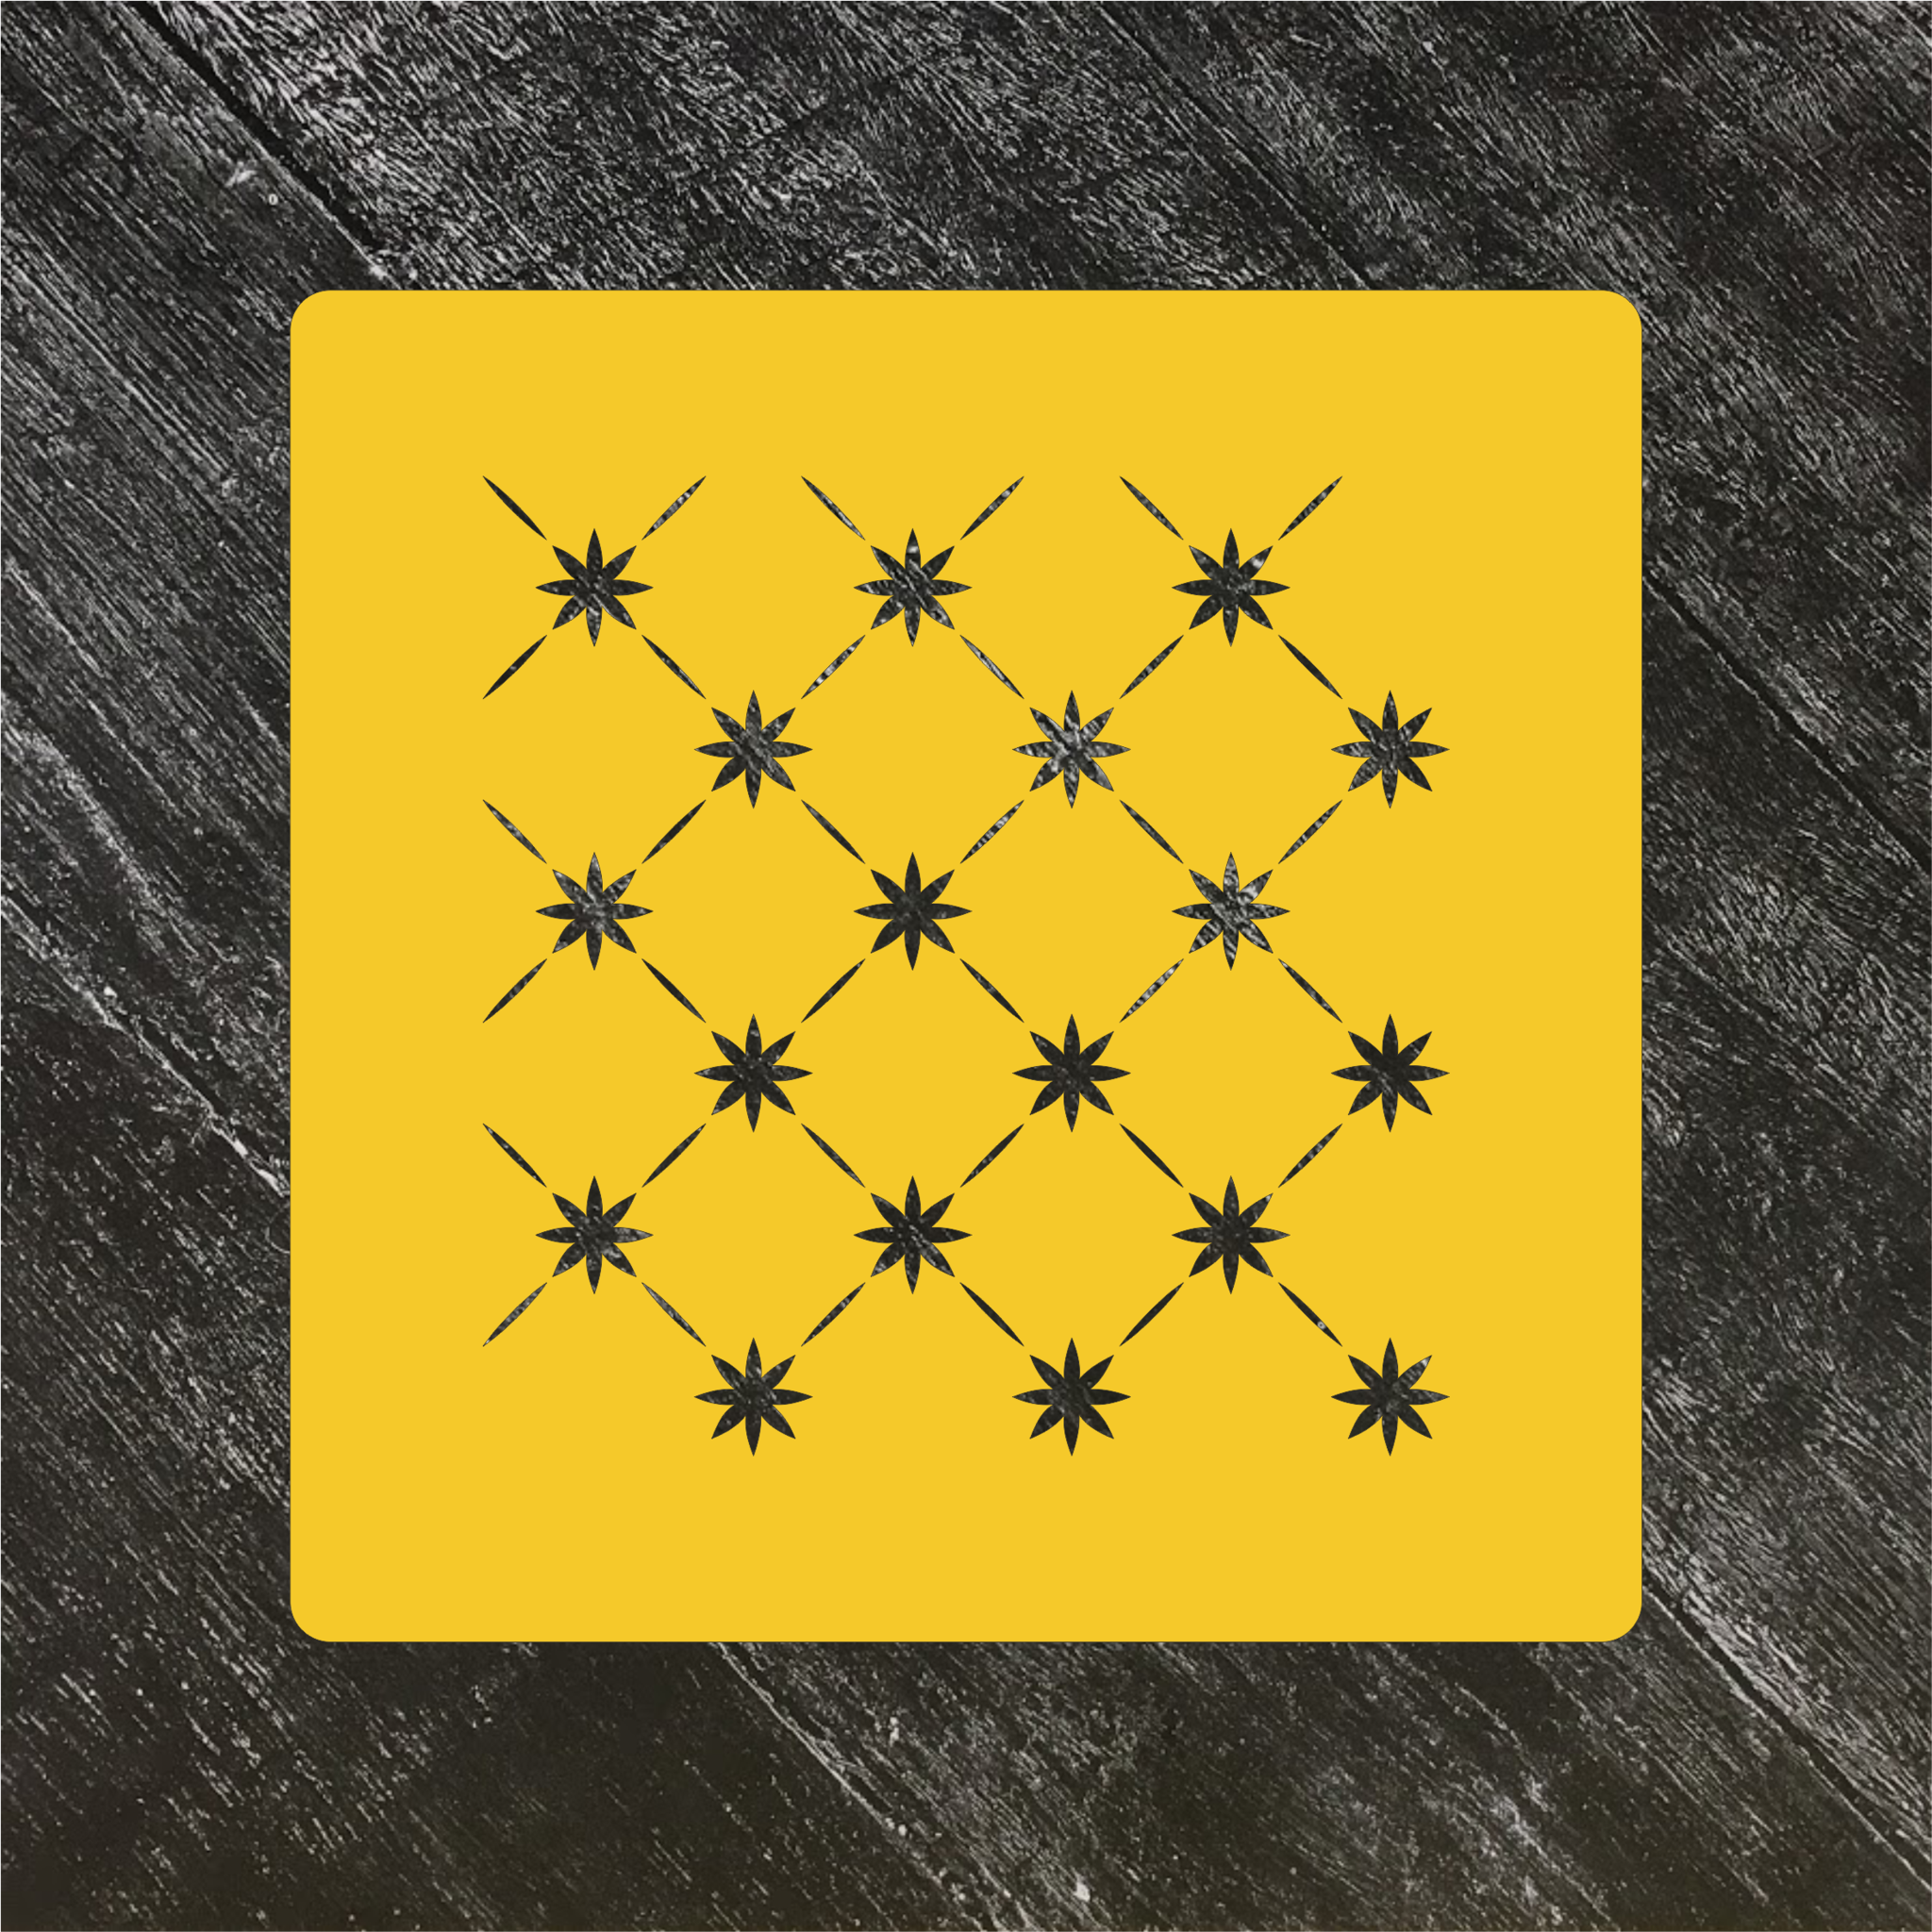 Трафарет-фон №7 Узор с звездами